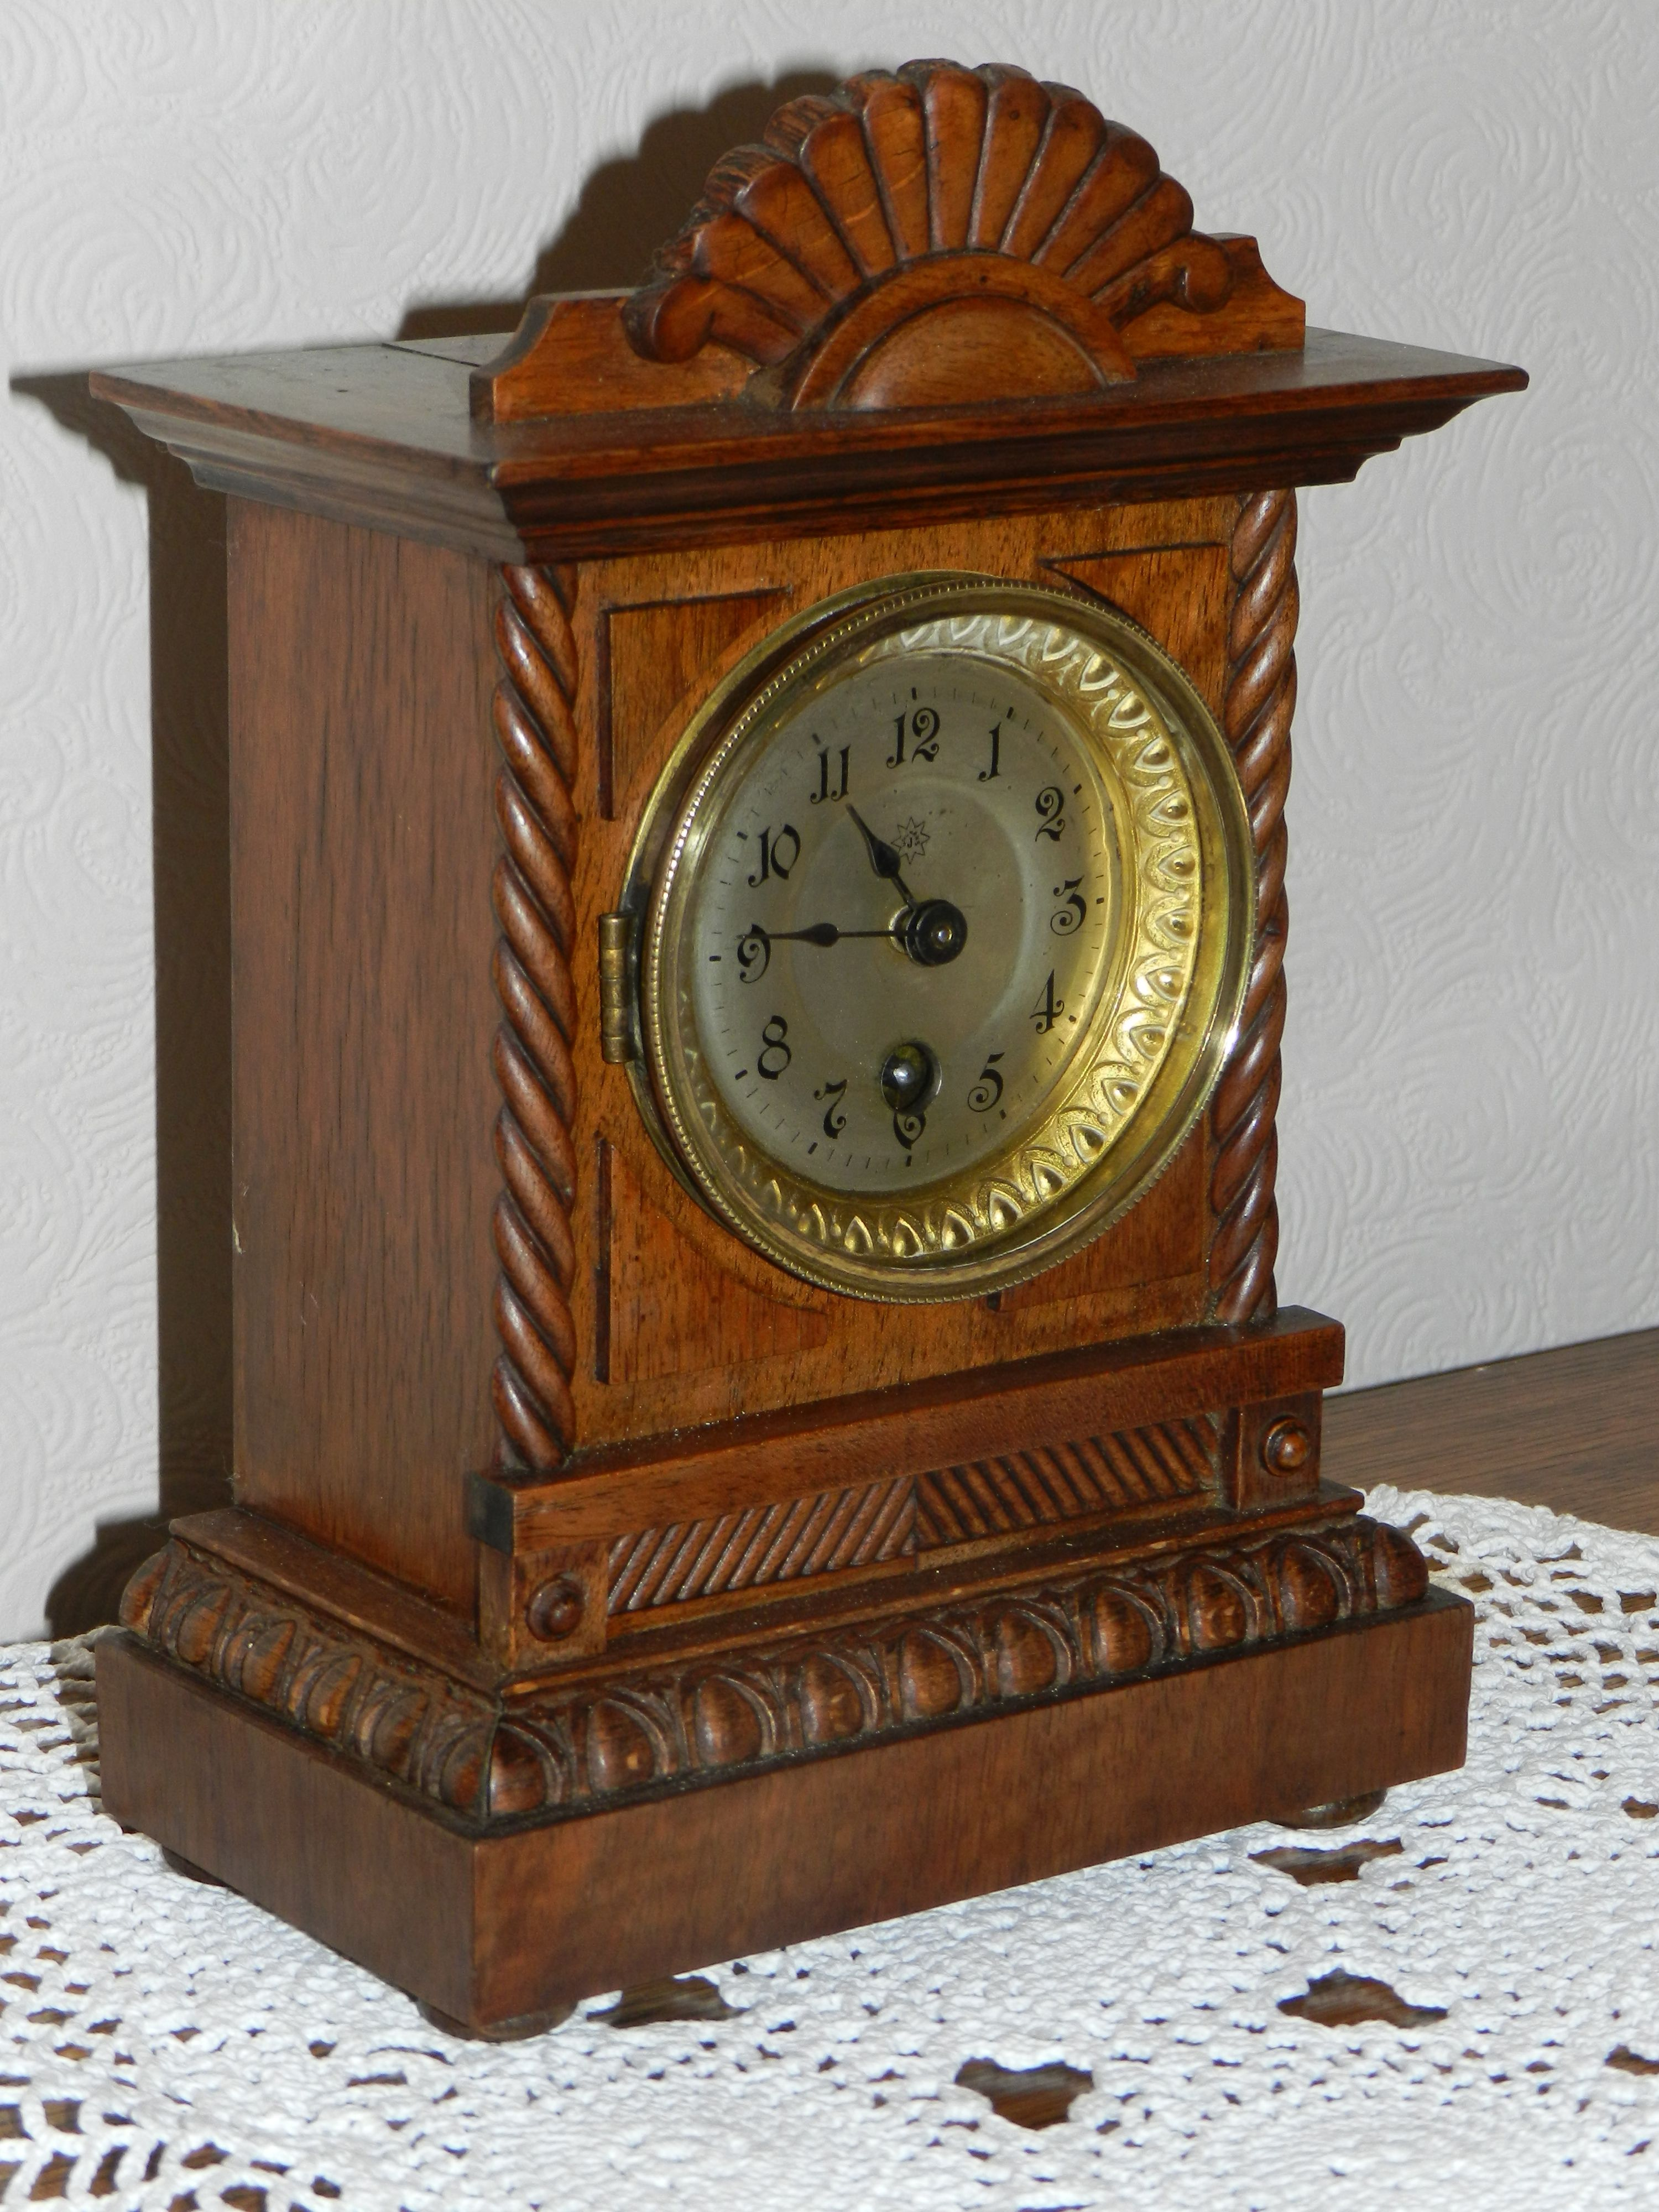 A Junghans Small Mantle Clock Around 1900s Antique Clocks Clock Mantle Clock